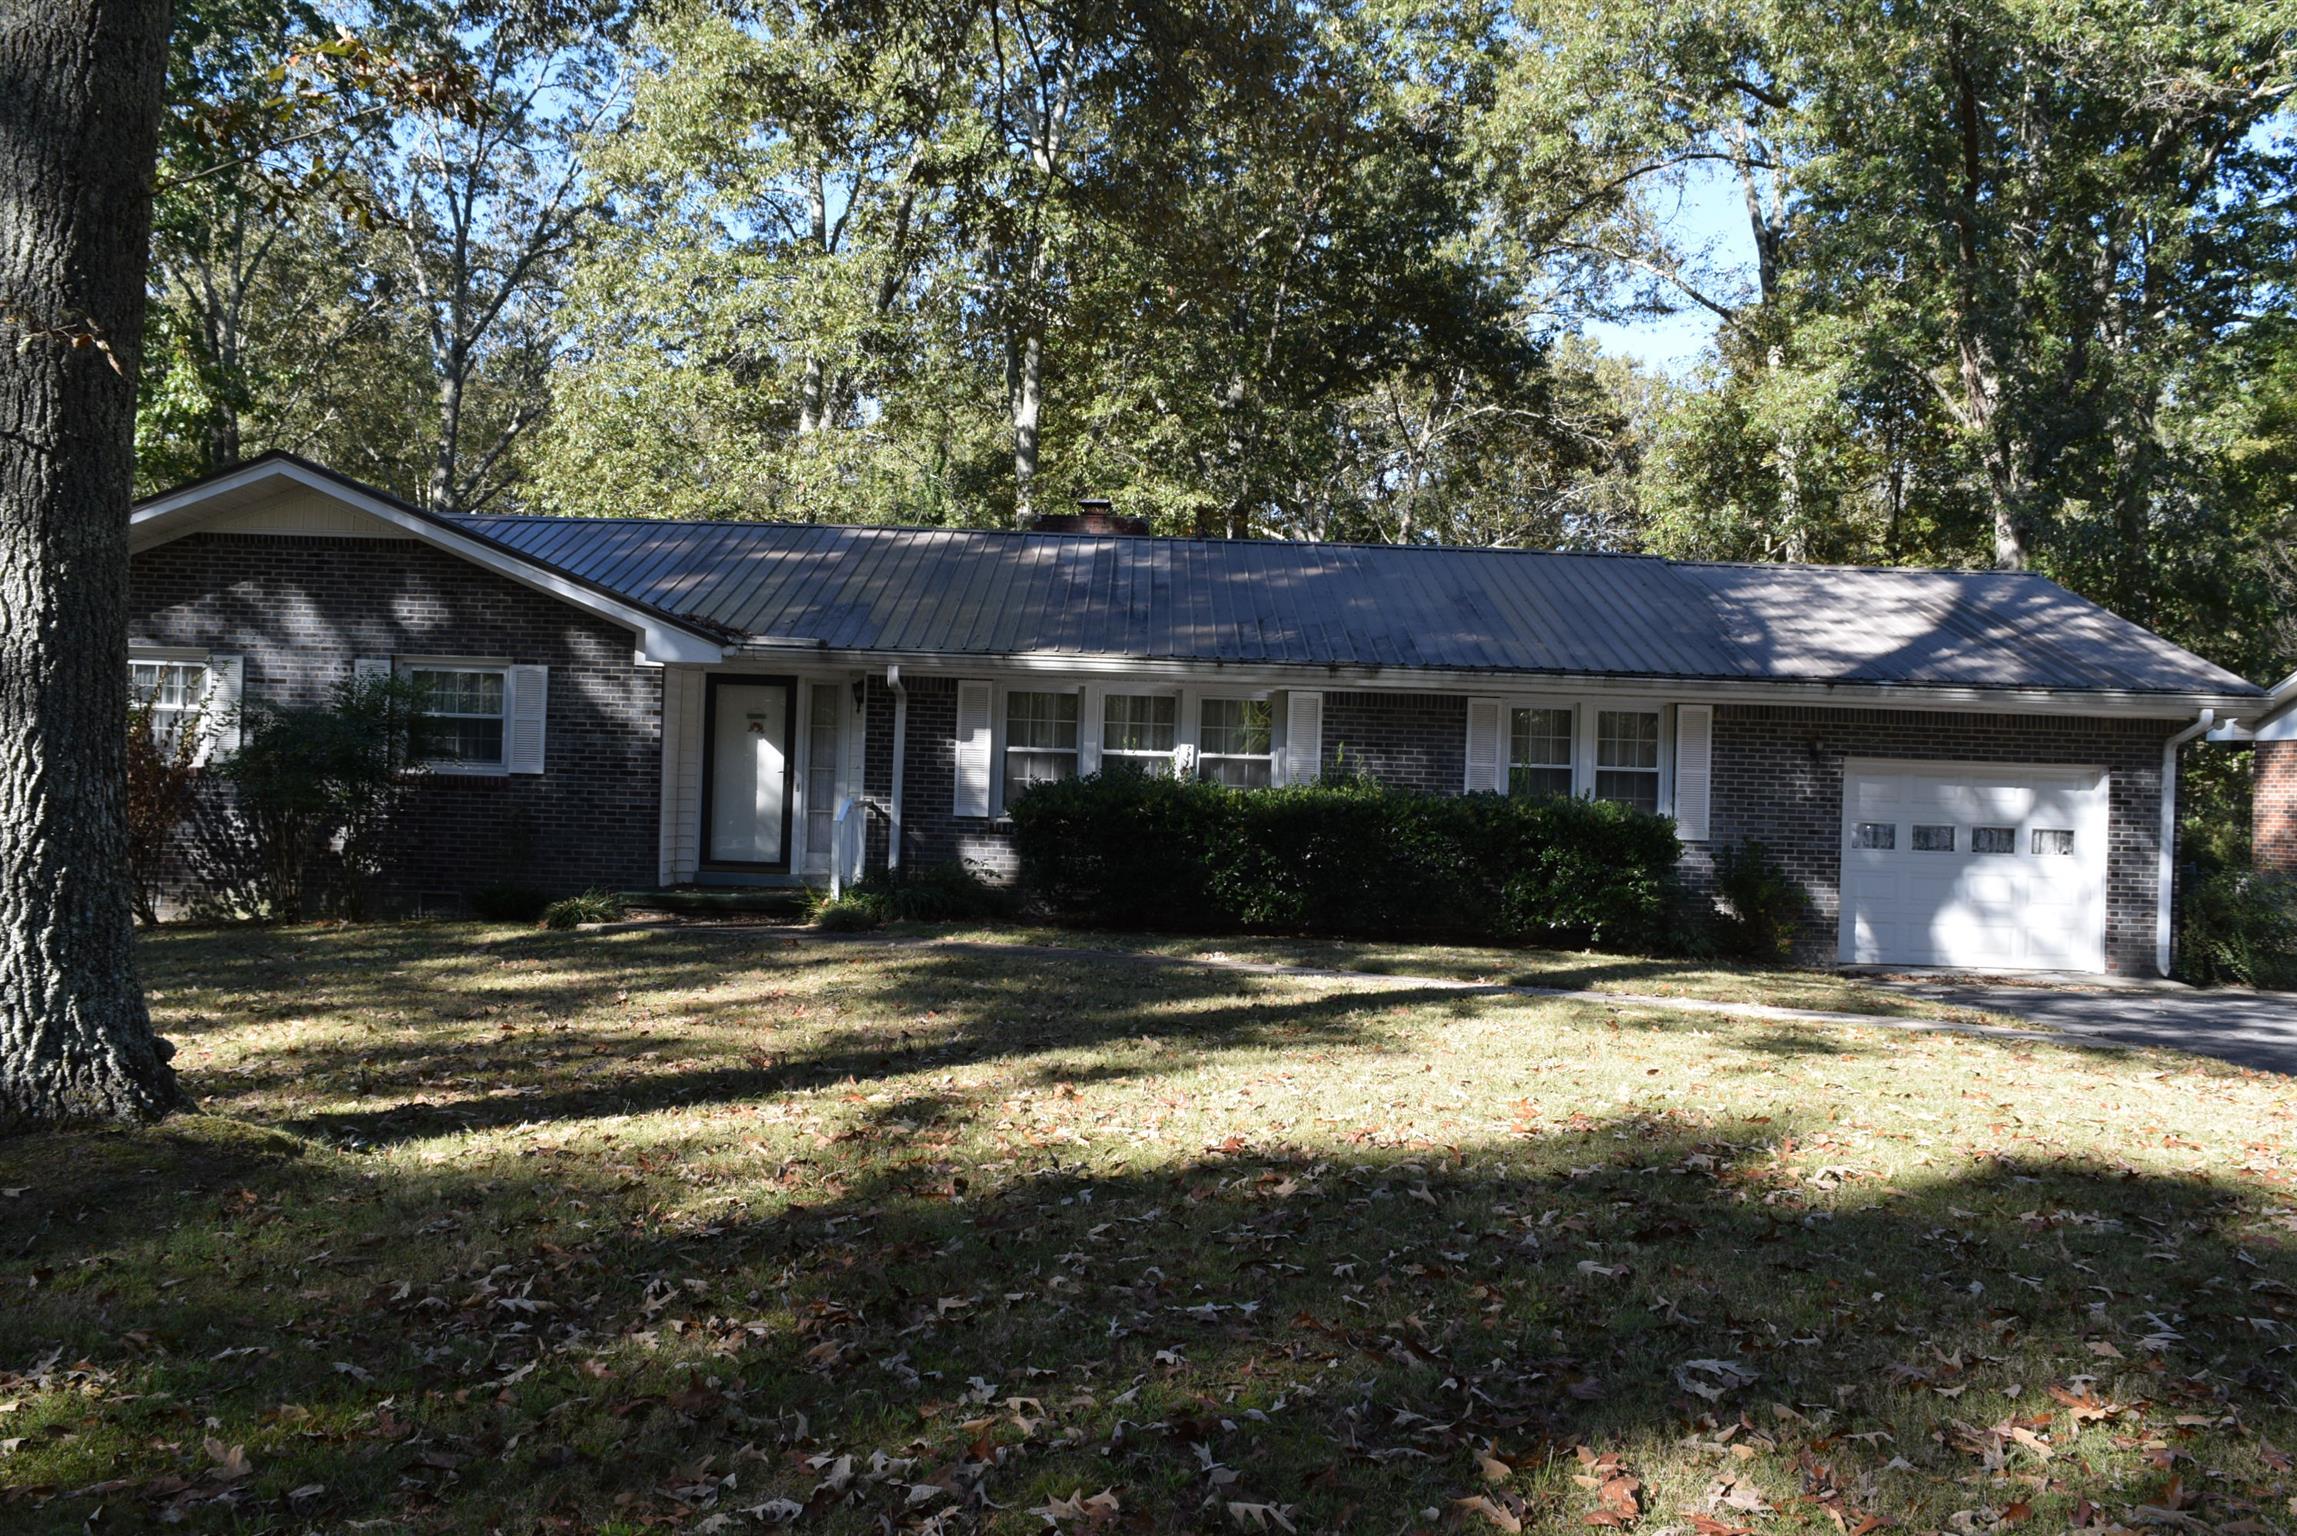 1128 Westwood Dr, Tullahoma, TN 37388 - Tullahoma, TN real estate listing